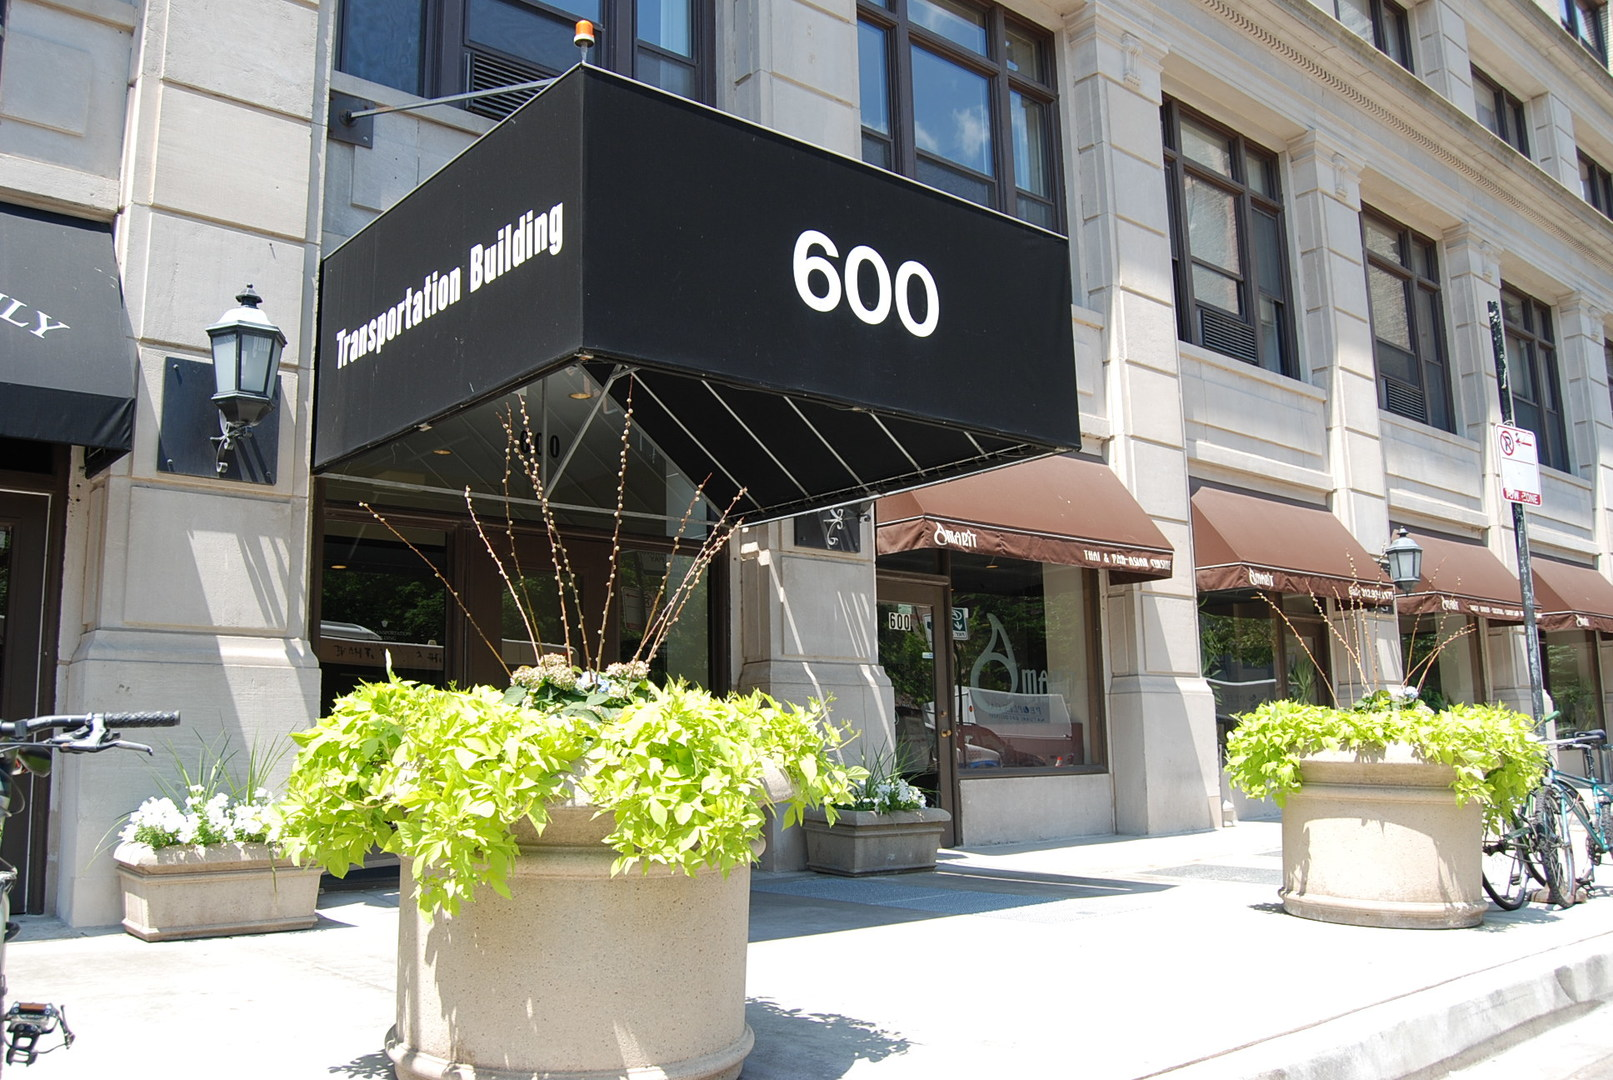 600 S. Dearborn #1503